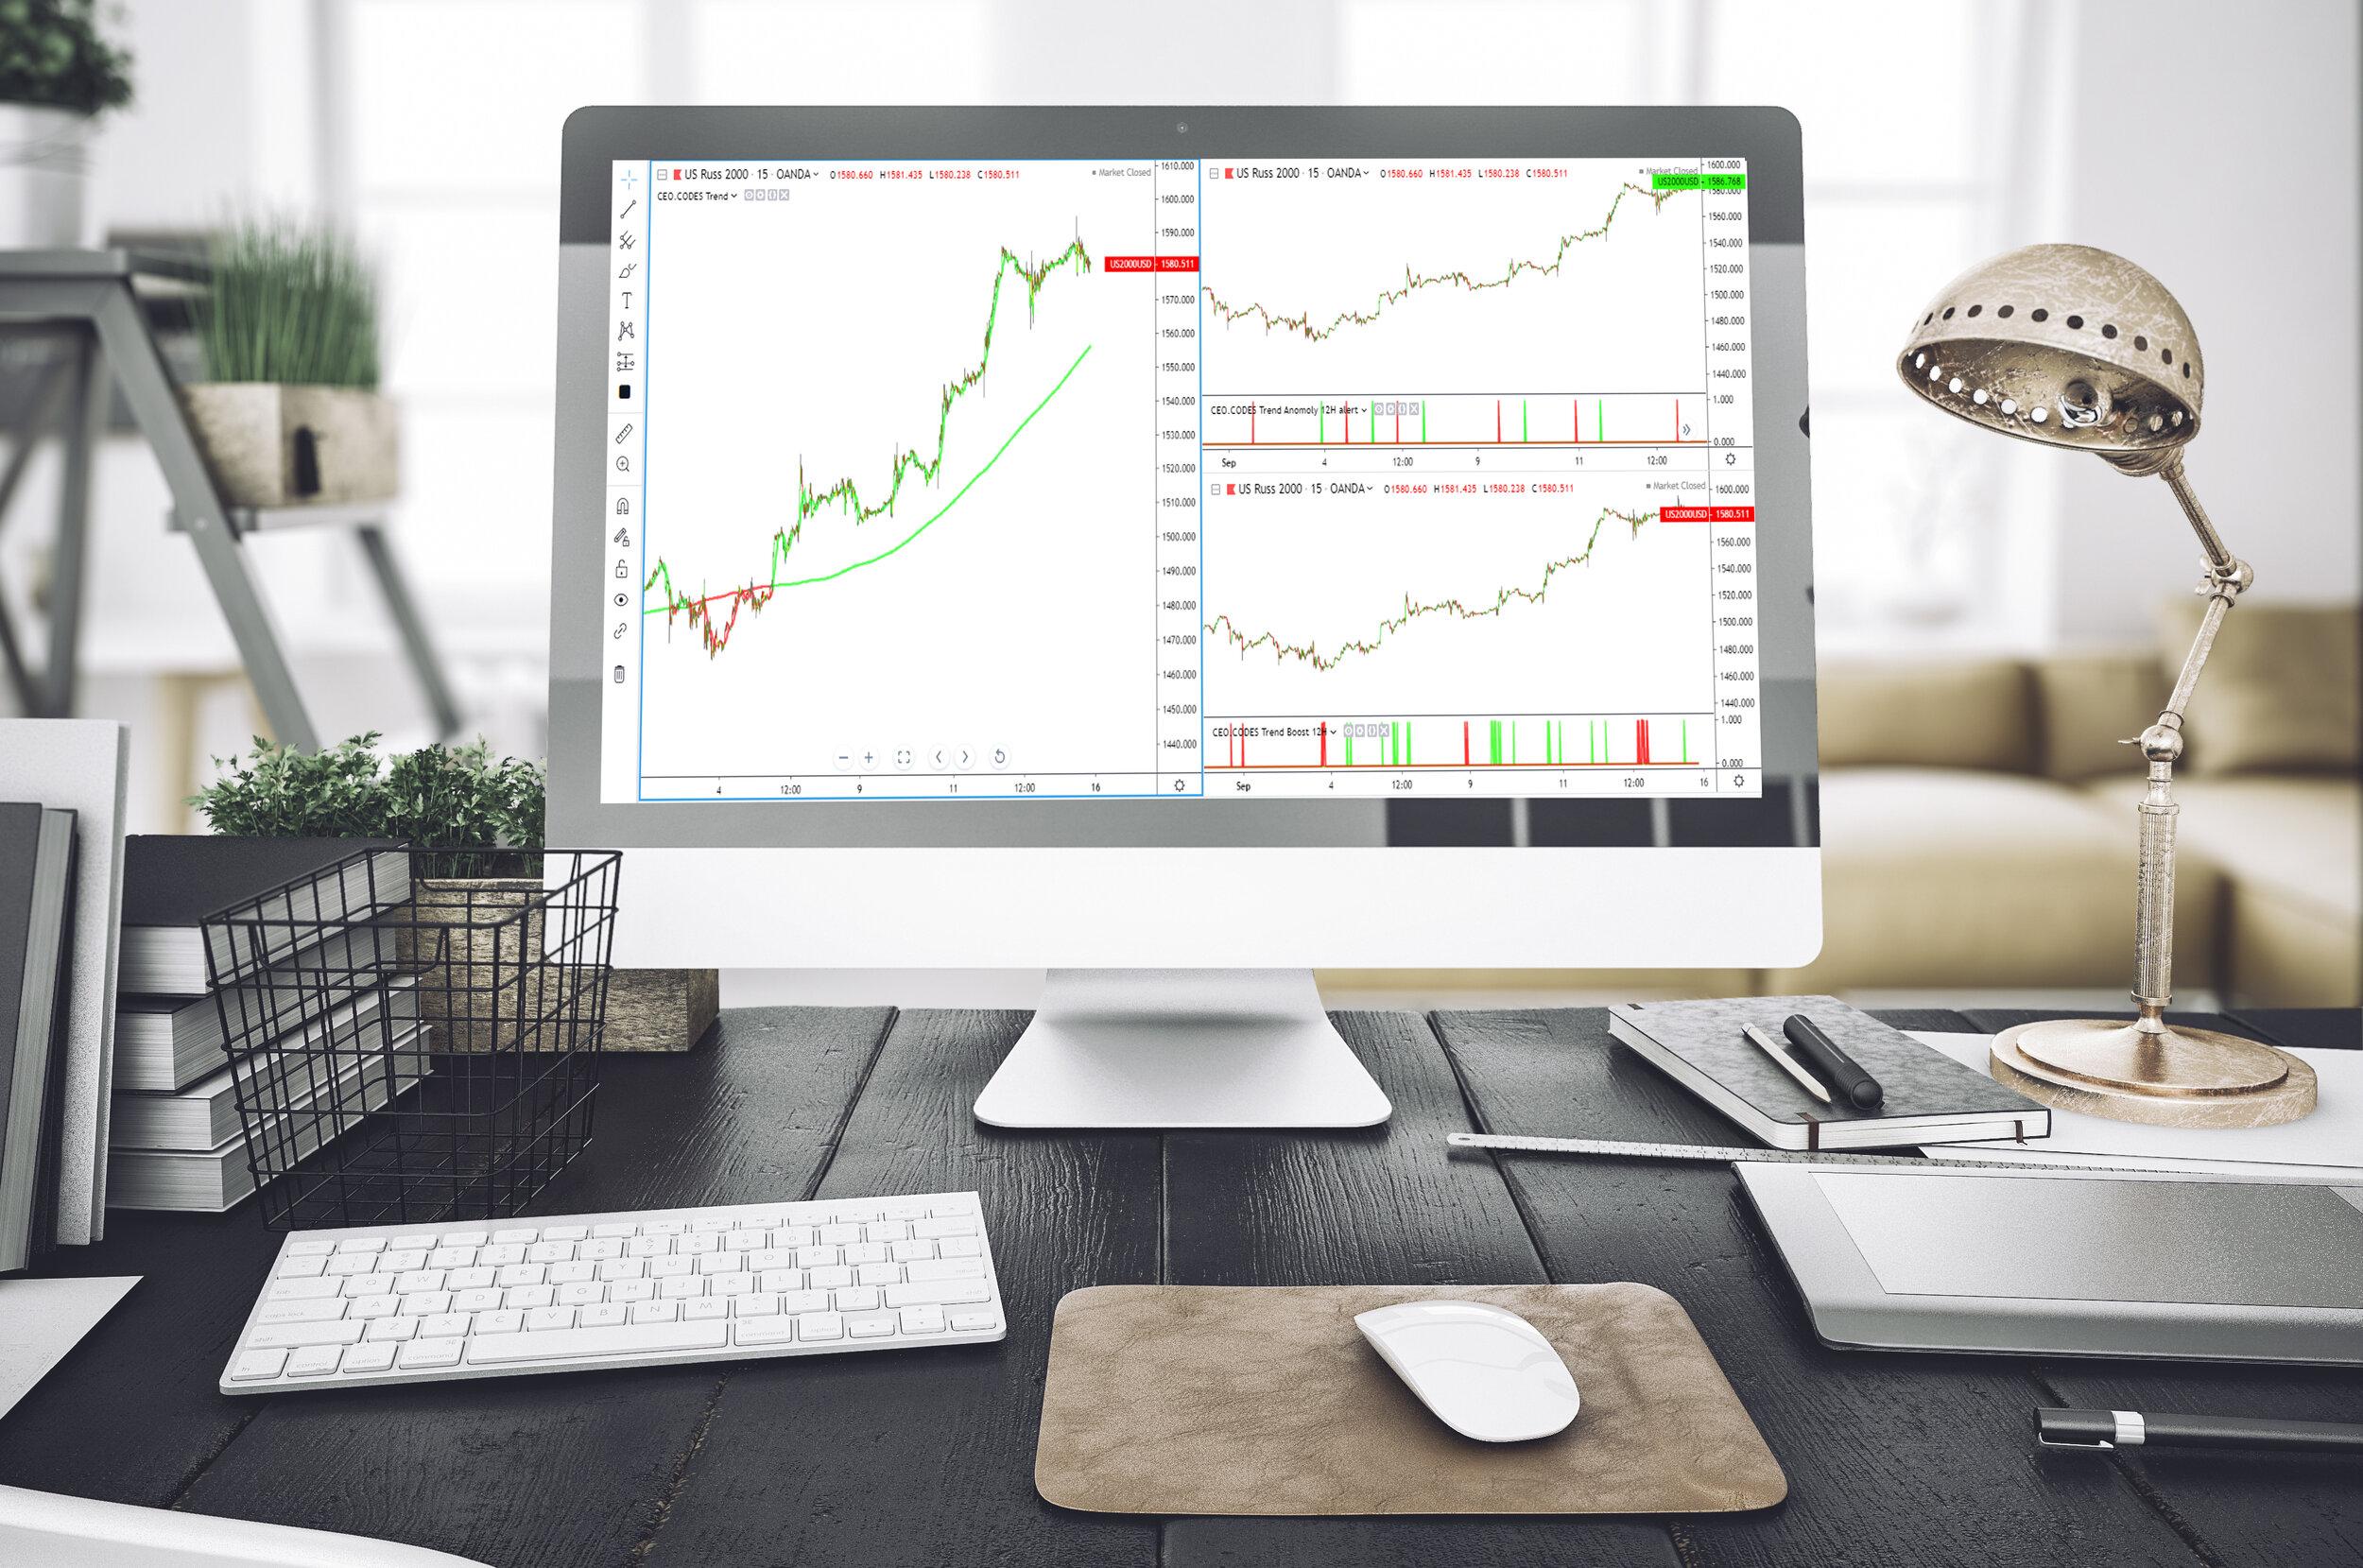 Ceo Codes Trading Indicators